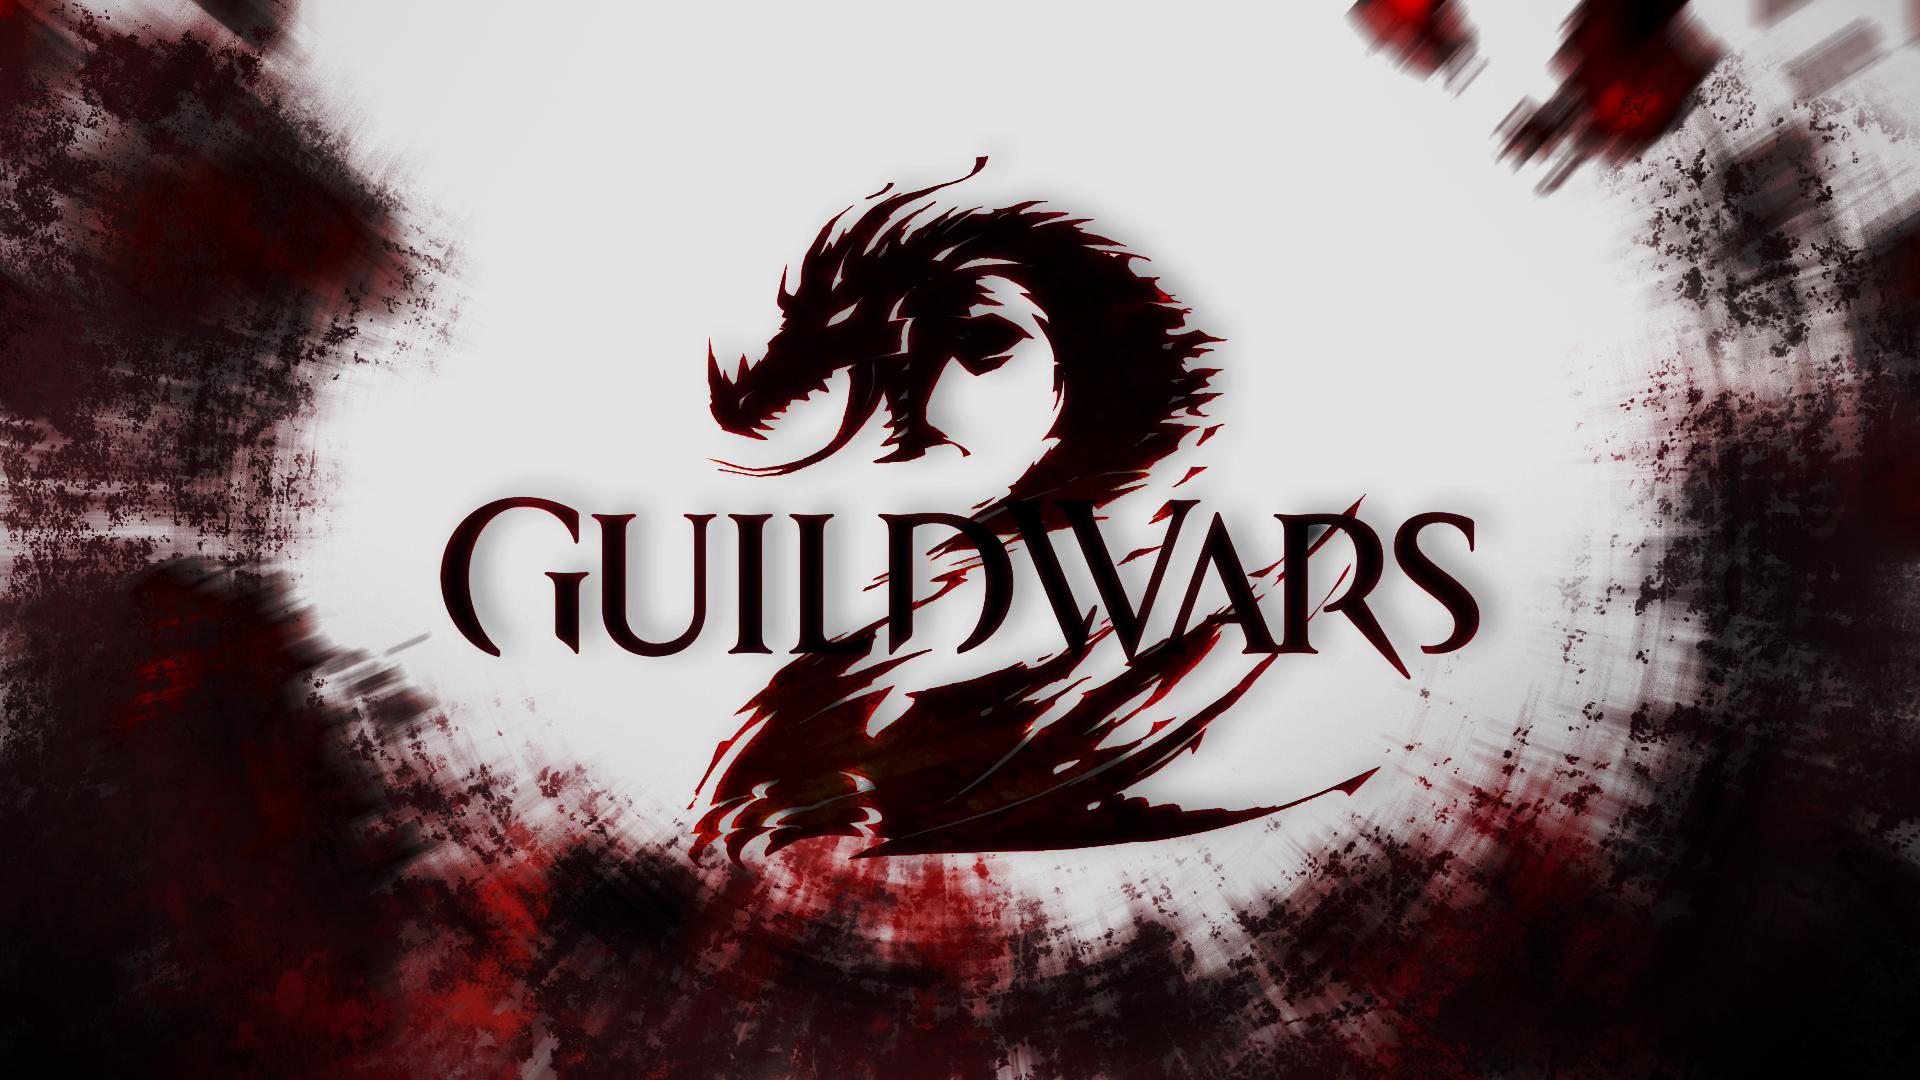 48 Guild Wars 2 Wallpaper Hd On Wallpapersafari